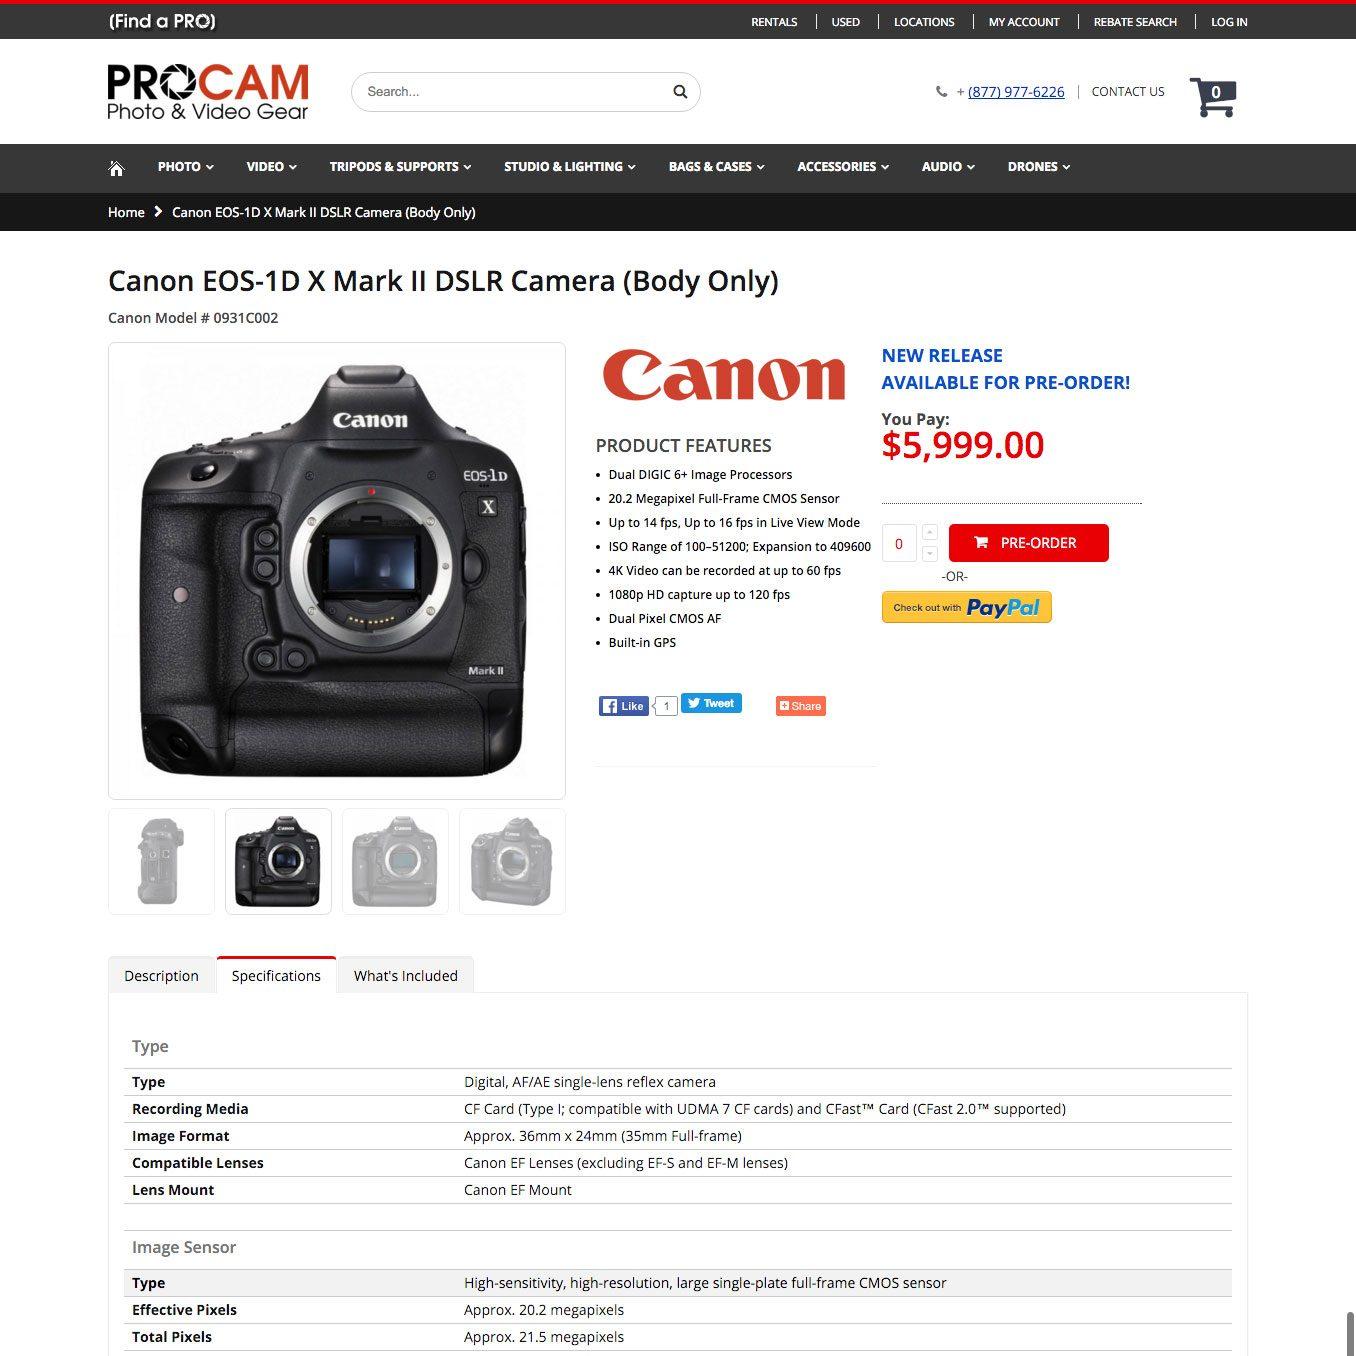 CanonEOS1DXMarkIIDSLRCameraSPECS1